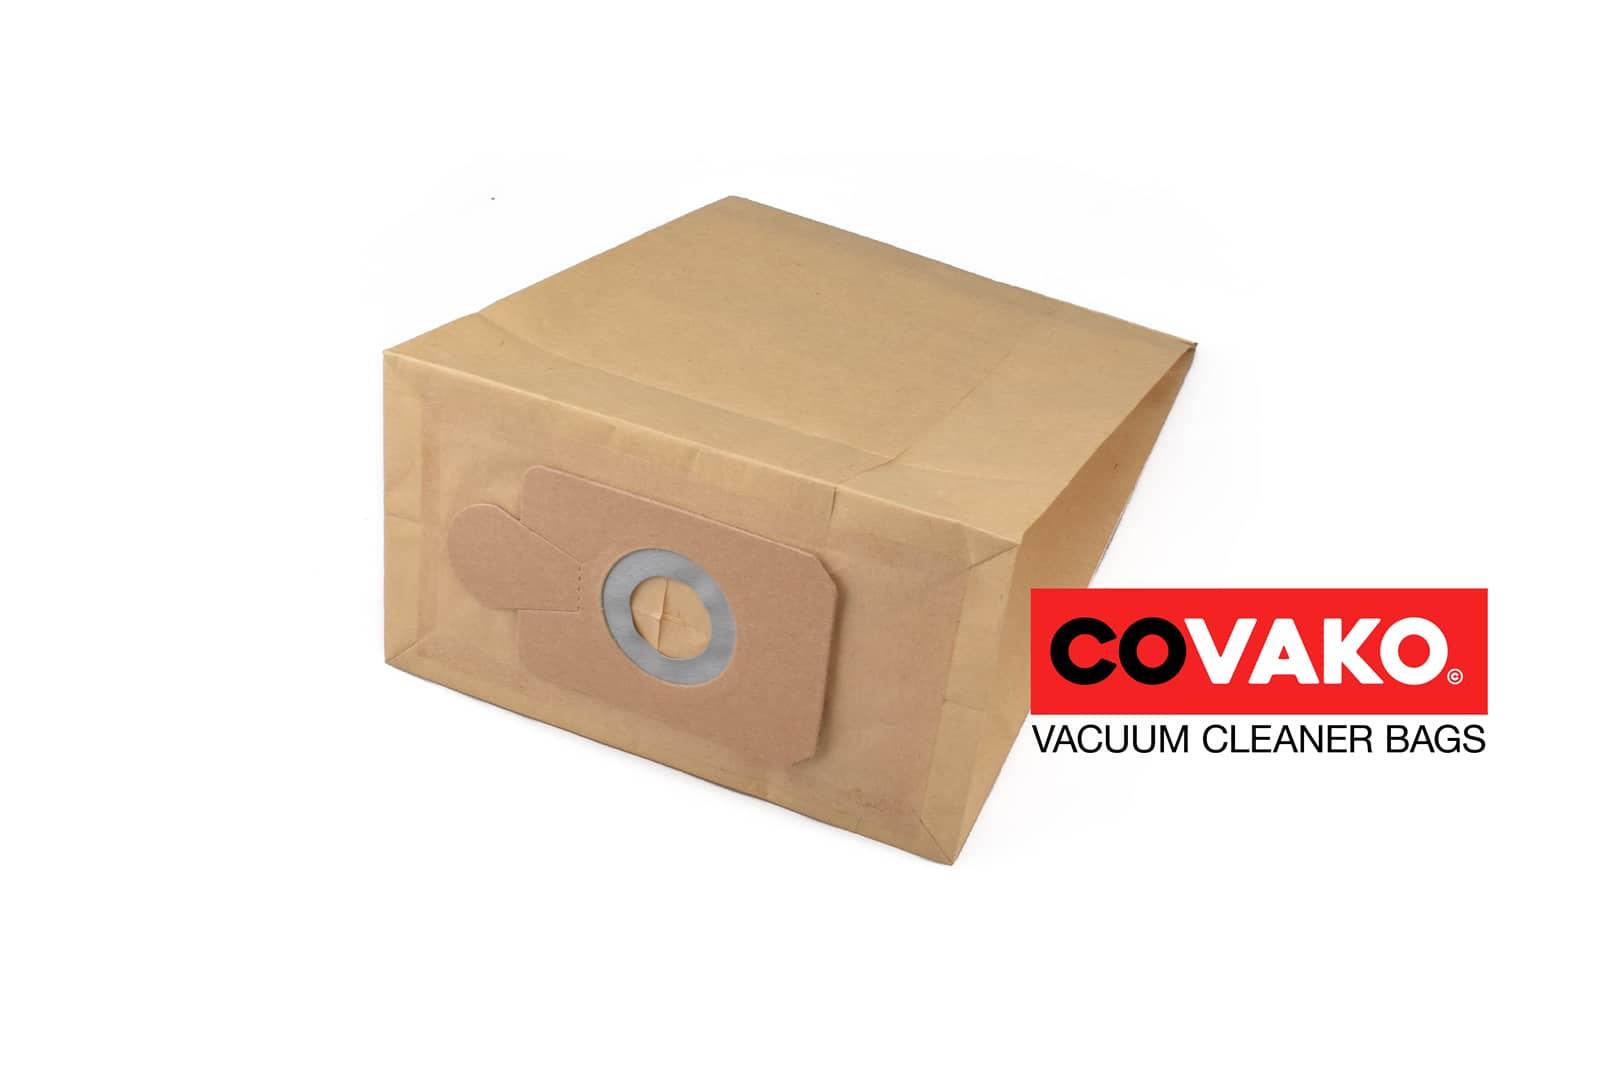 Numatic HVR 160-11 / Paper - Numatic vacuum cleaner bags